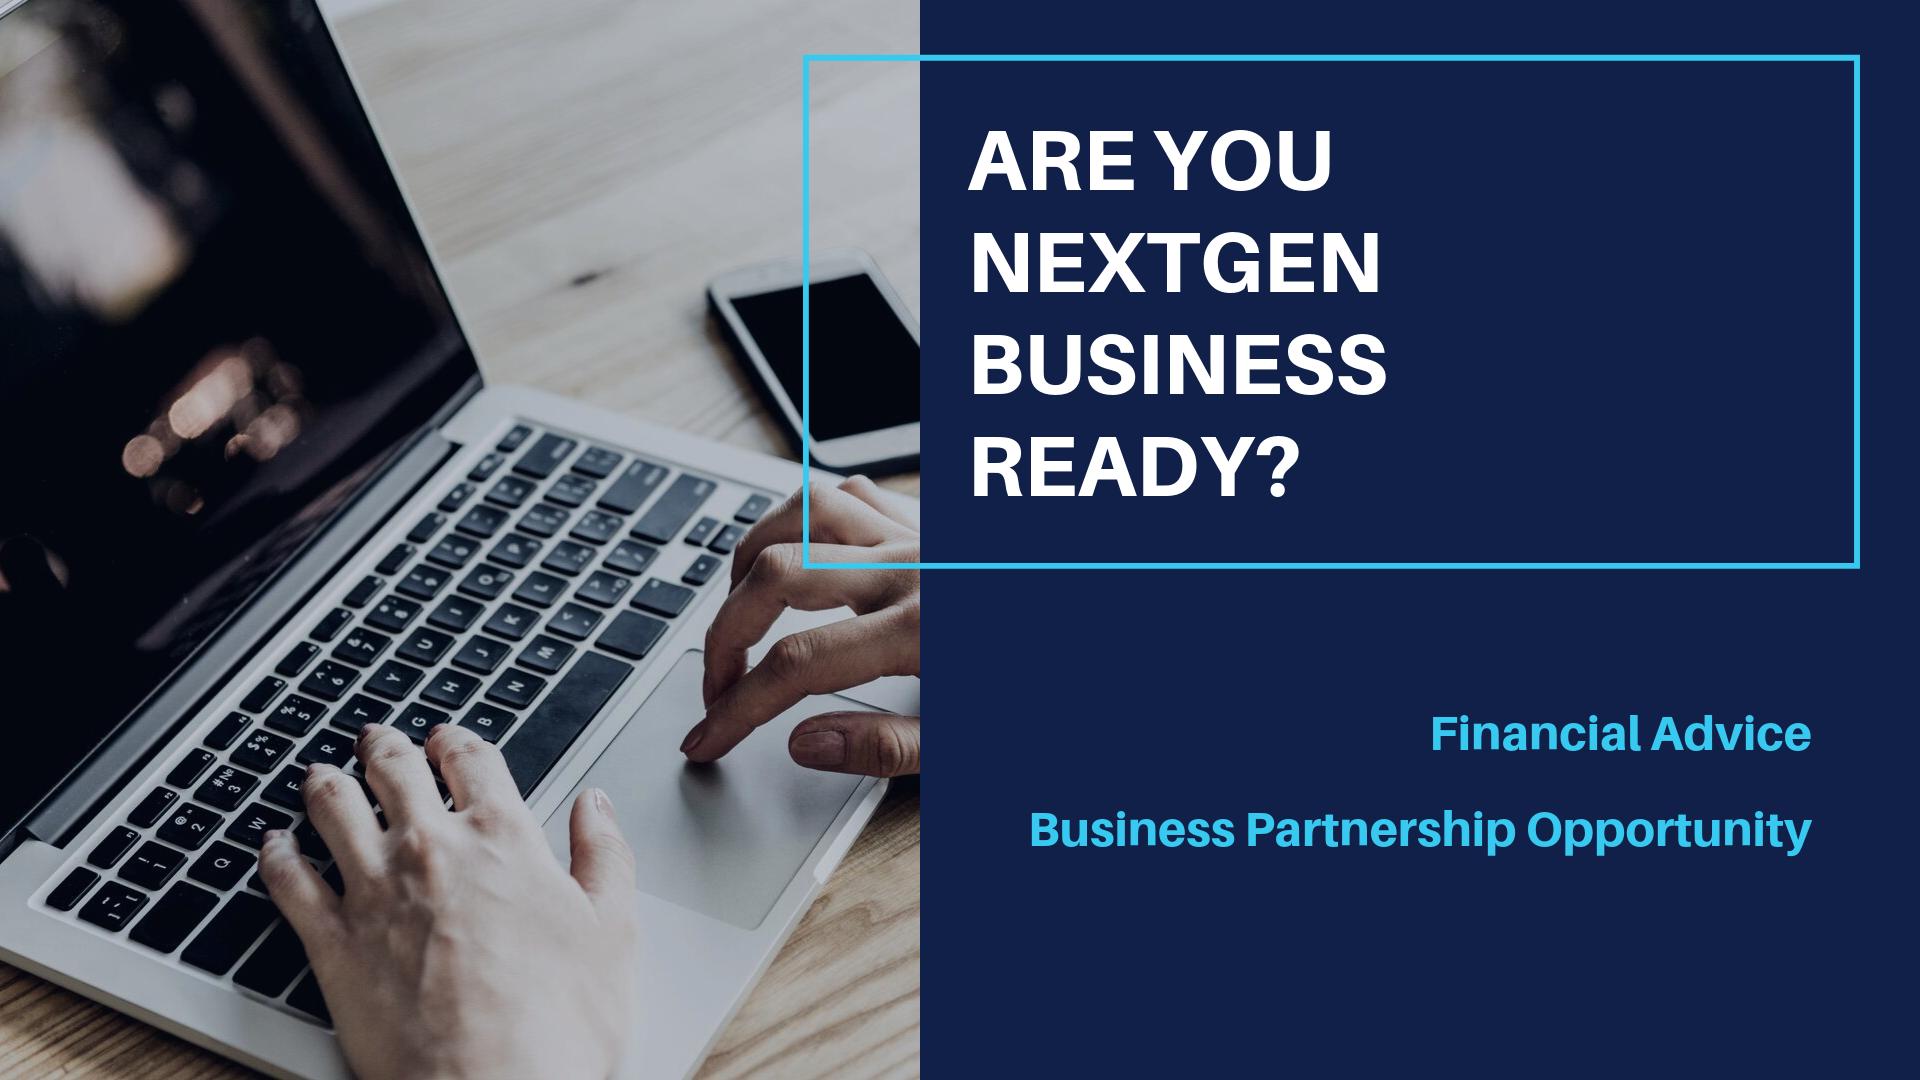 Recruit 2 Advice - Business Partnership Opportunity